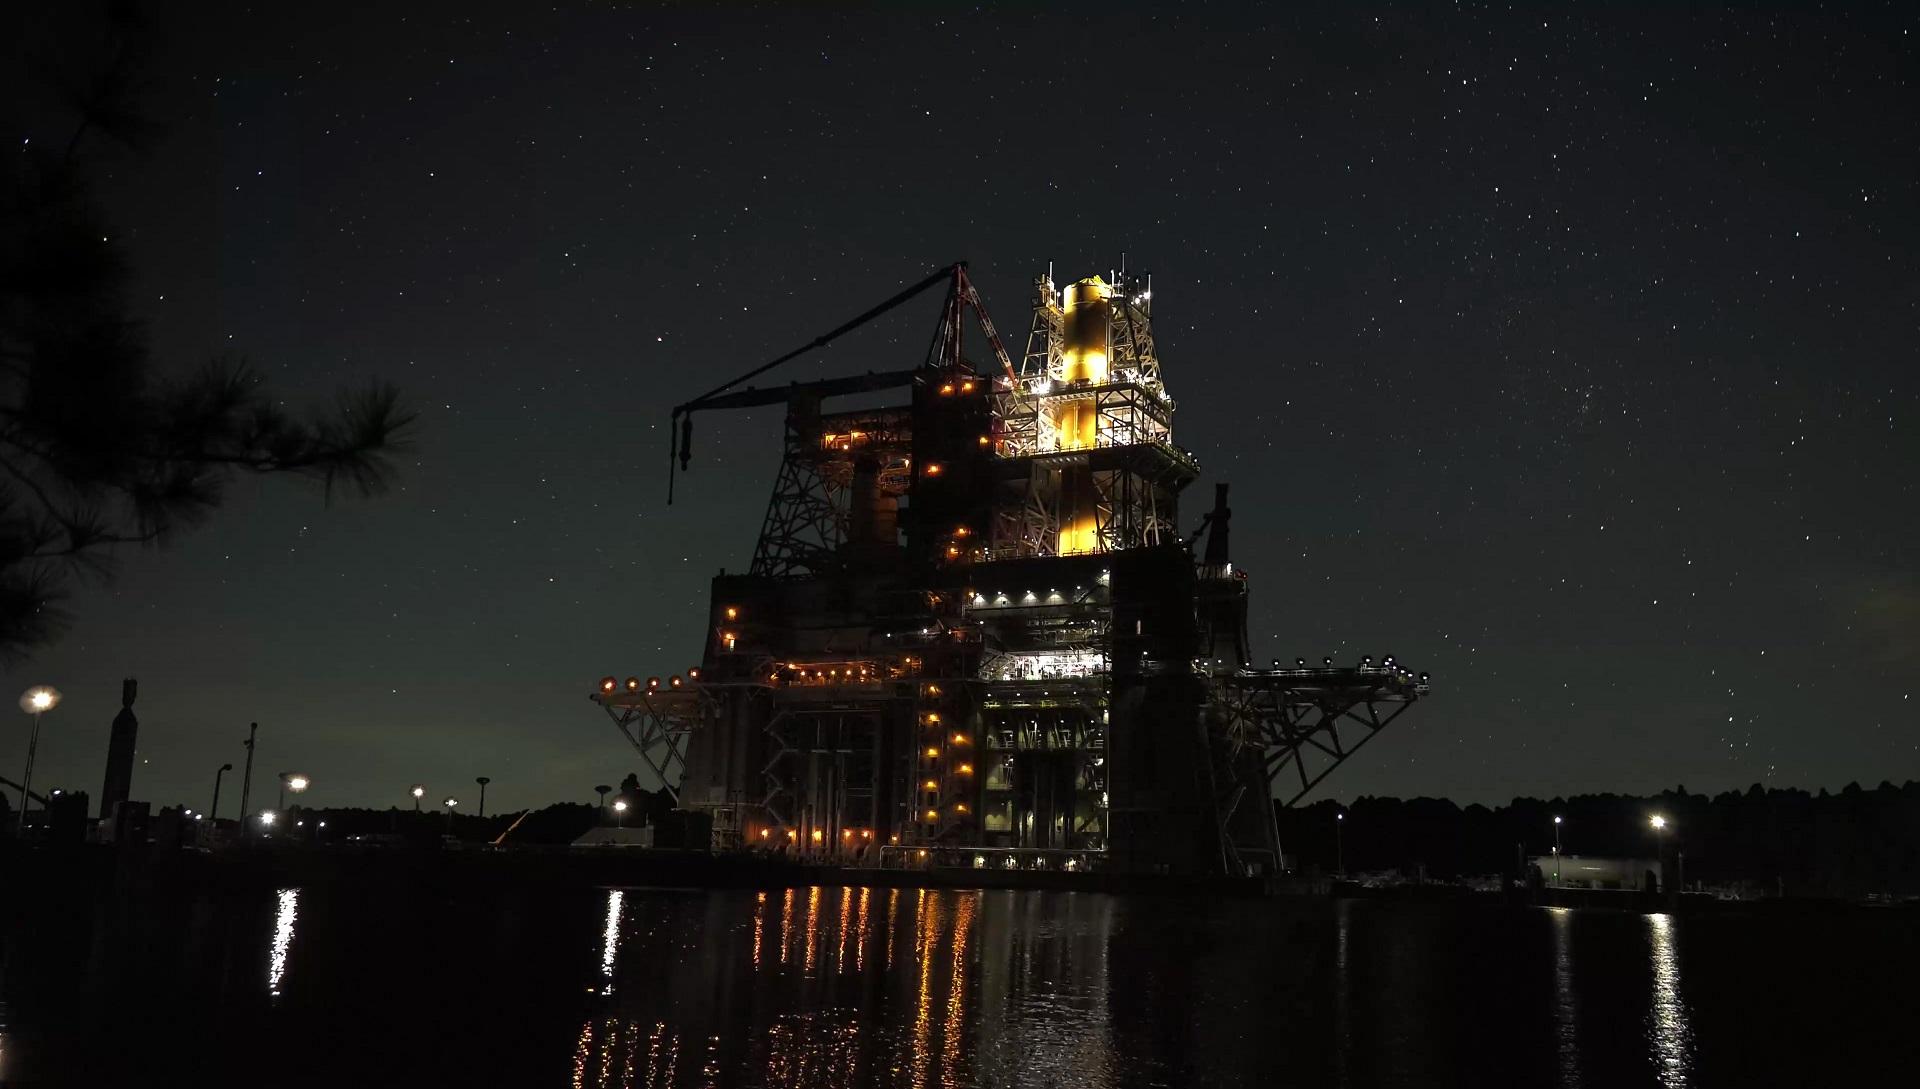 NASA reschedules final SLS Core Stage Green Run tests for December